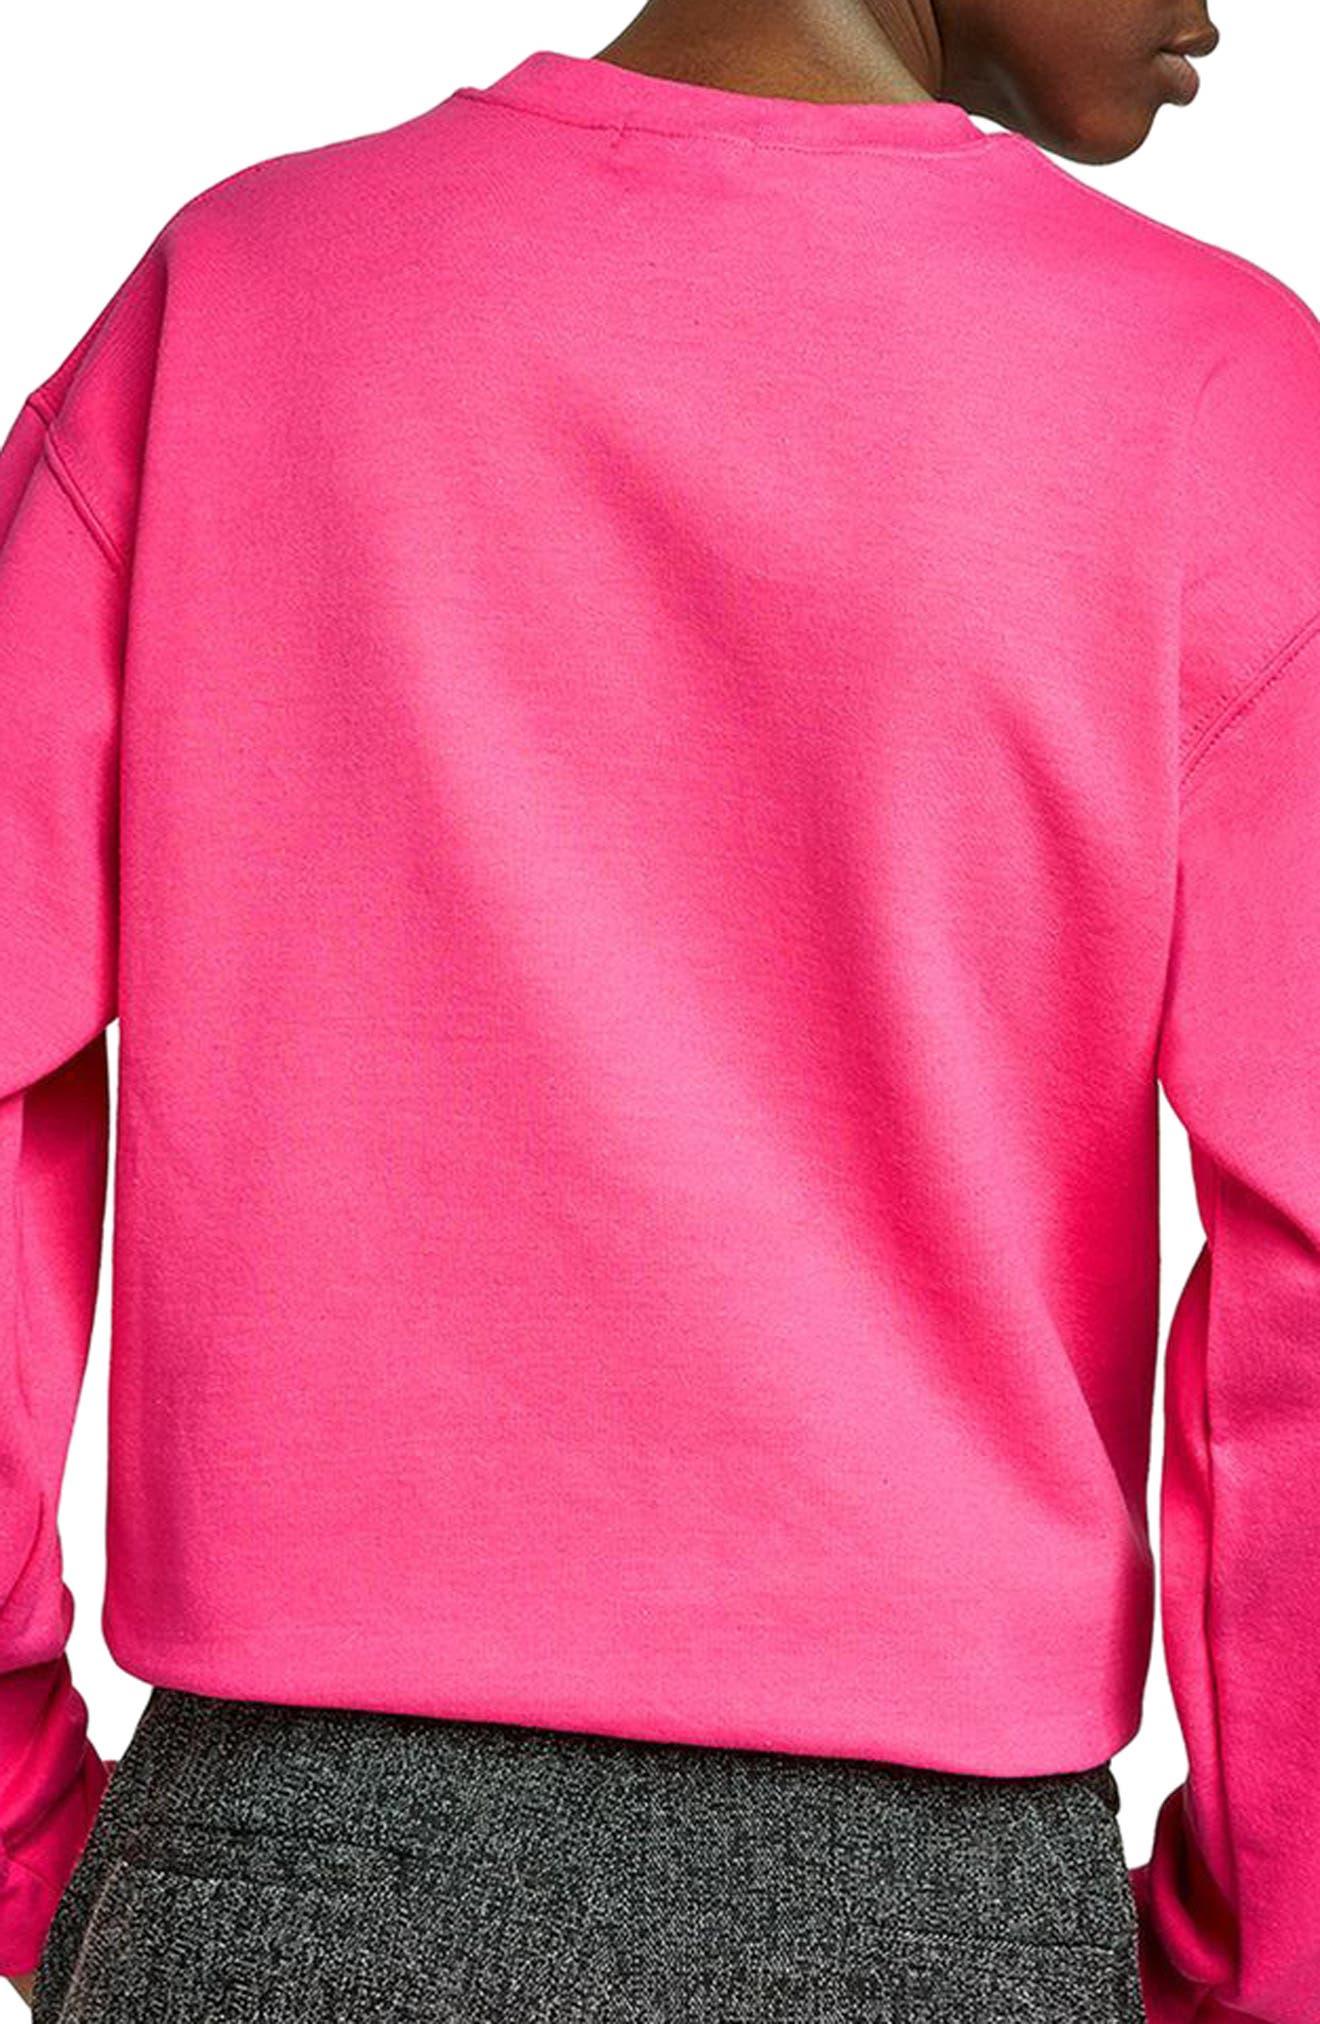 Urban Idols Graphic Sweatshirt,                             Alternate thumbnail 2, color,                             650